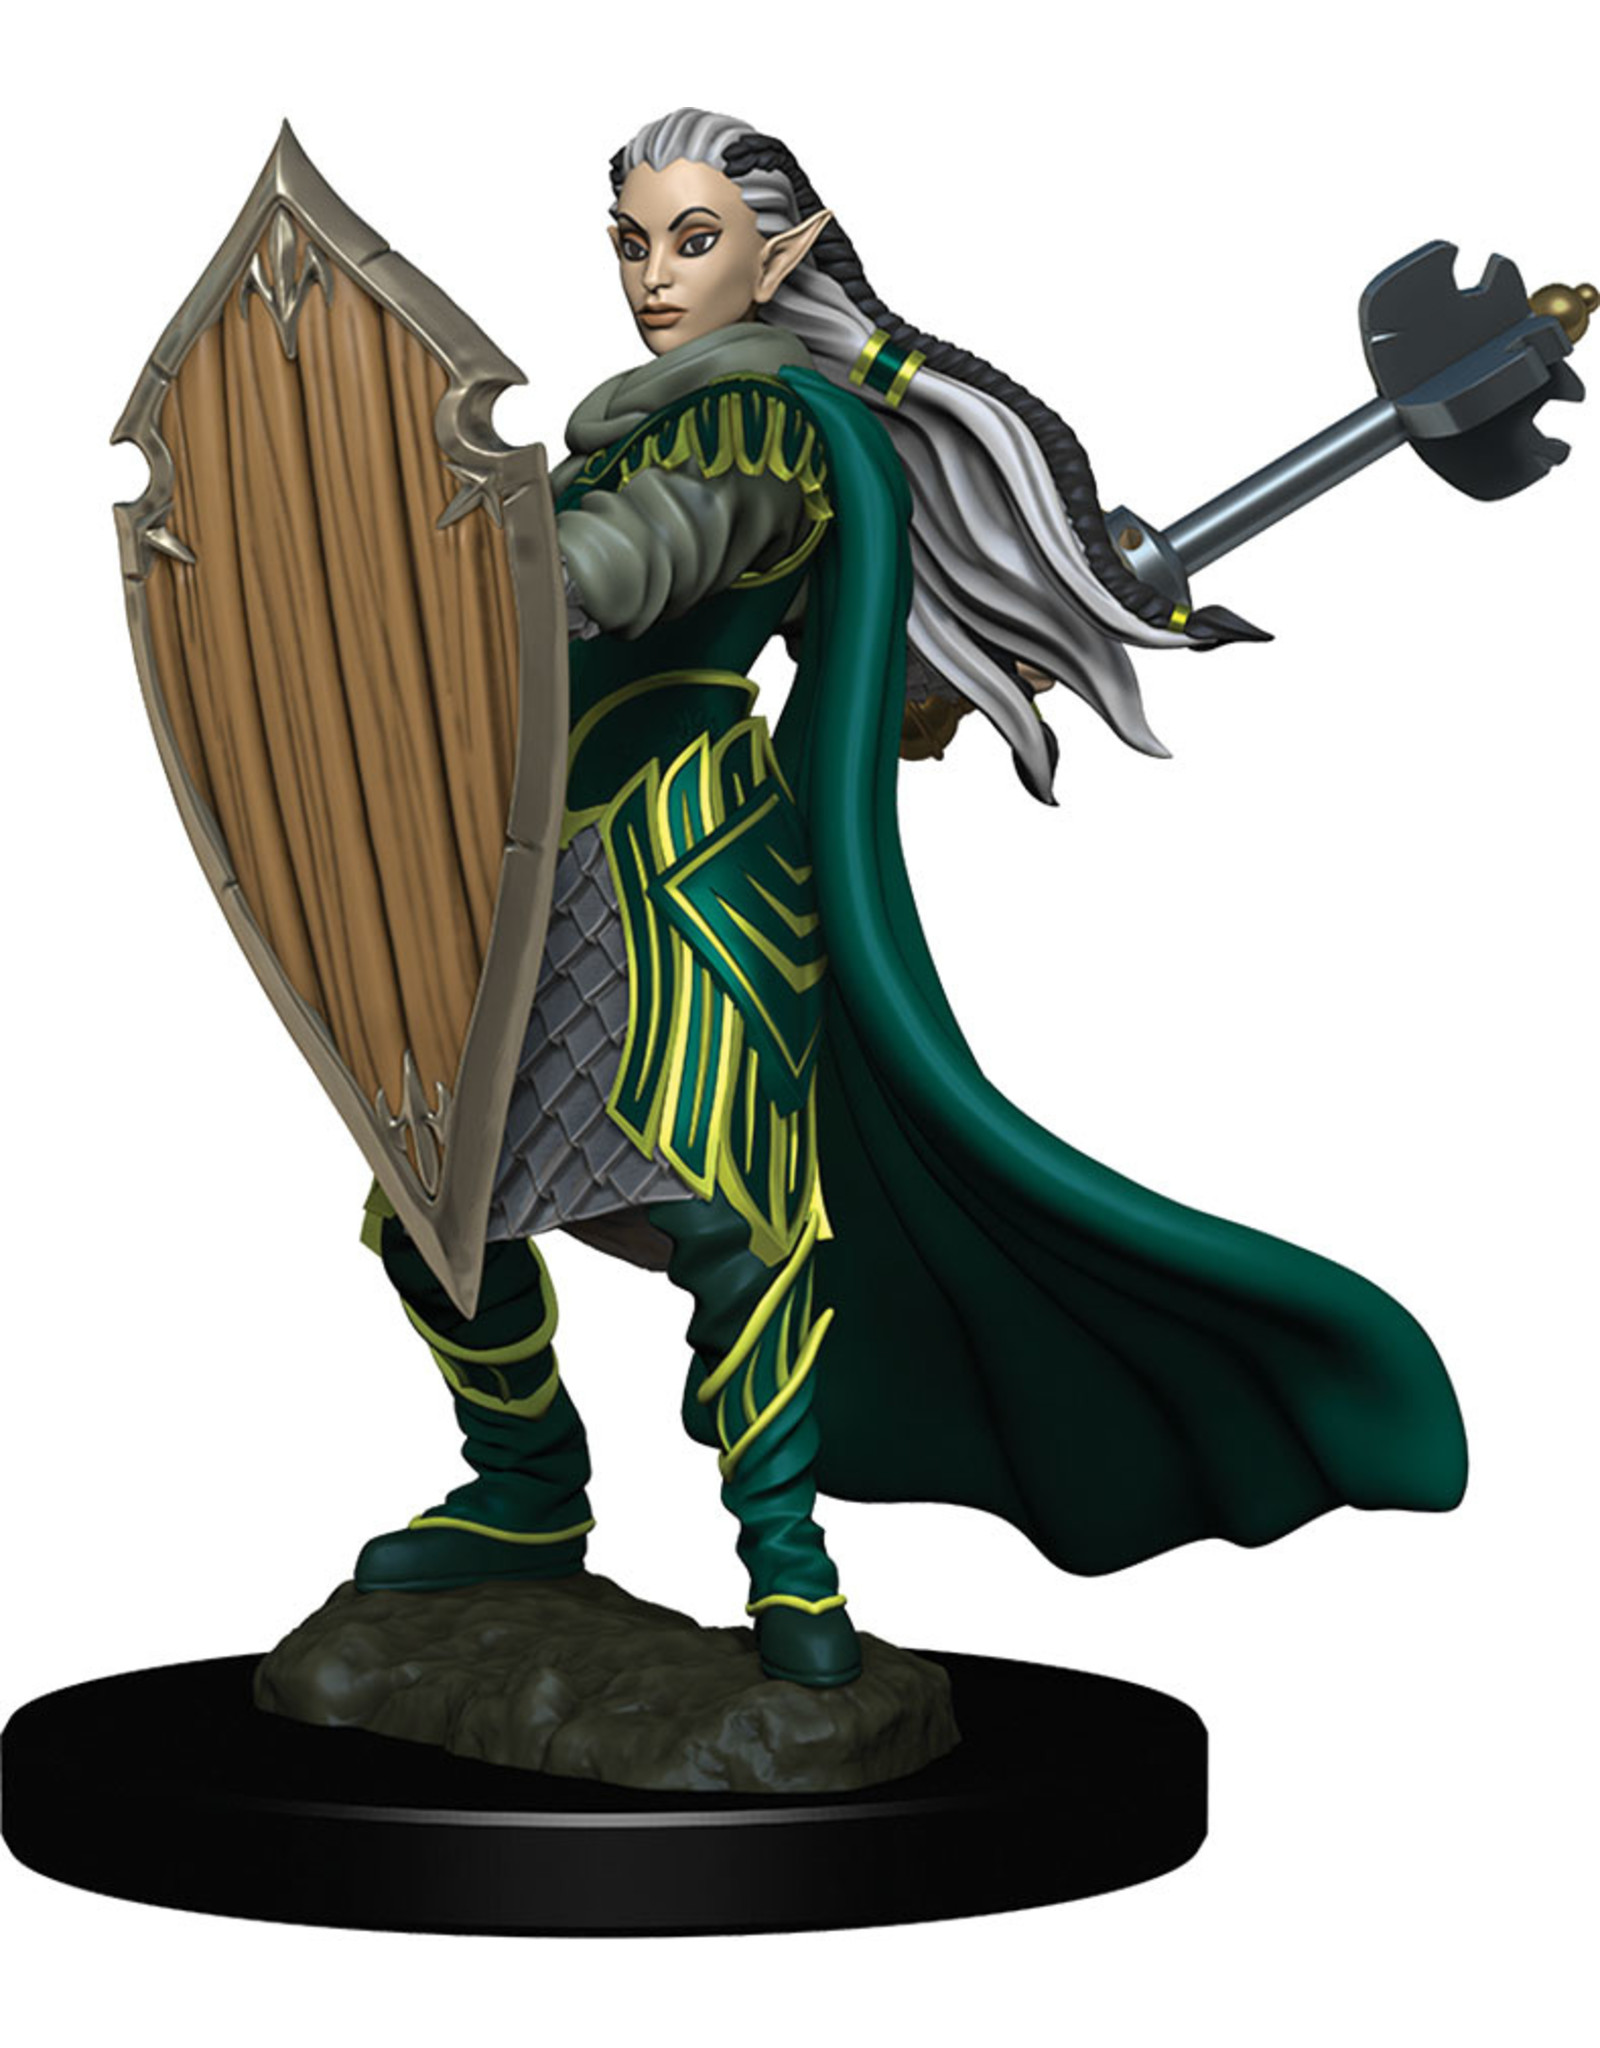 WizKids Dungeons & Dragons Fantasy Miniatures: Icons of the Realms Premium Figures W4 Elf Paladin Female